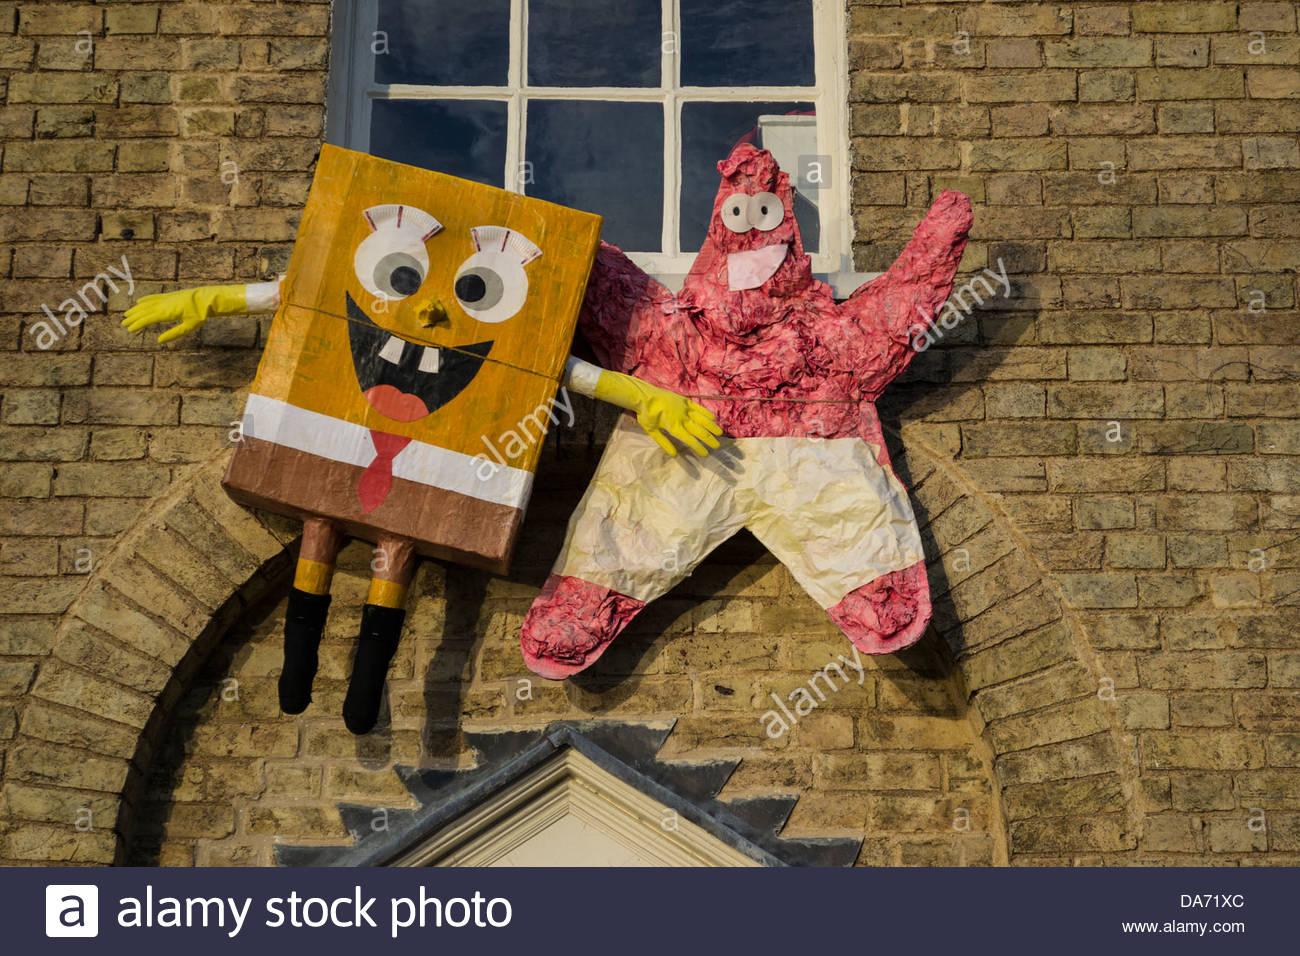 Spongebob Stock Photos & Spongebob Stock Images - Alamy